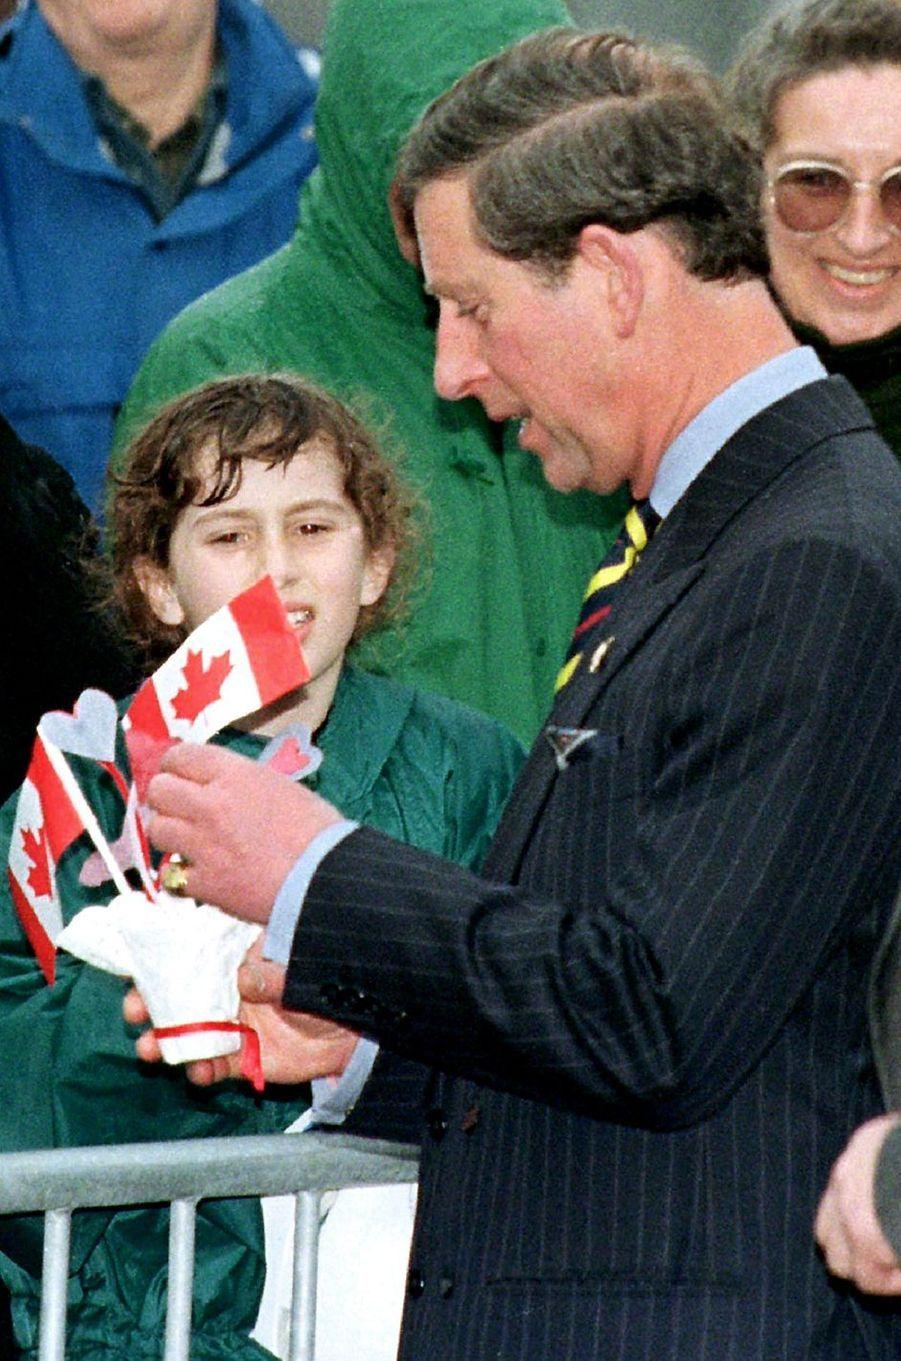 Le prince Charles à Ottawa, le 23 avril 1996